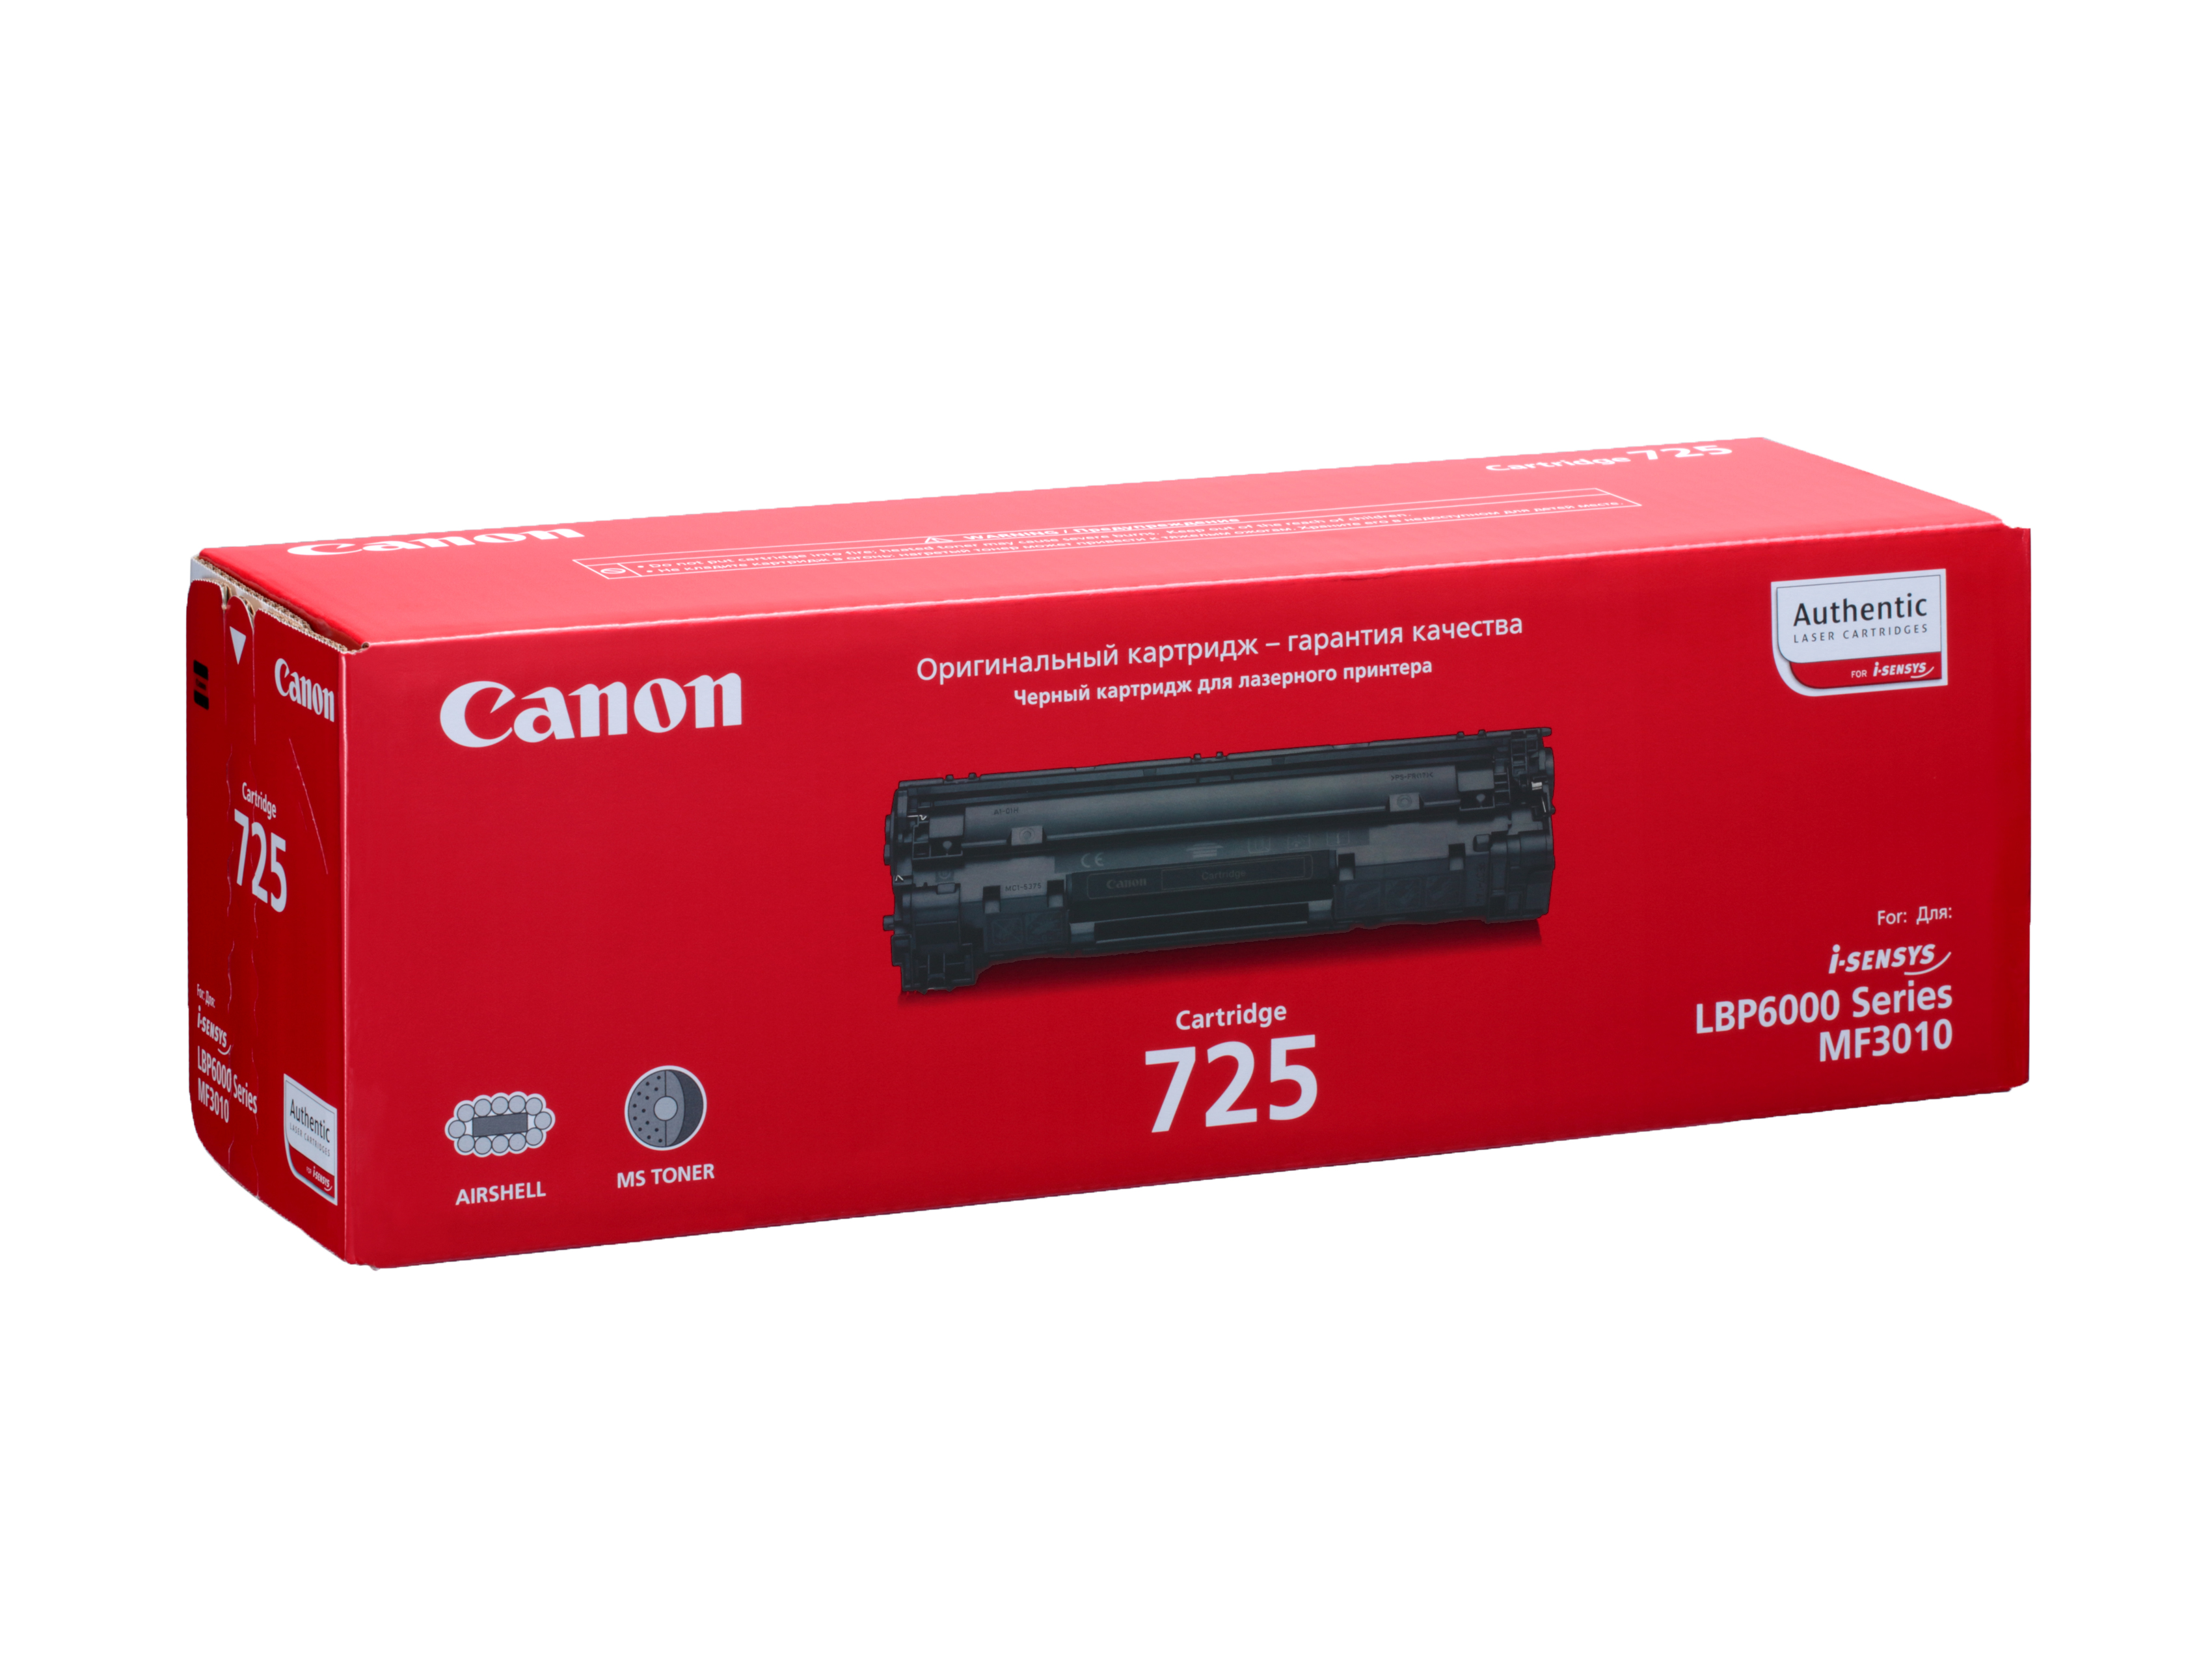 Картридж Canon 725 для LBP-6000/LBP-6000B. Чёрный. 1600 страниц. цена и фото